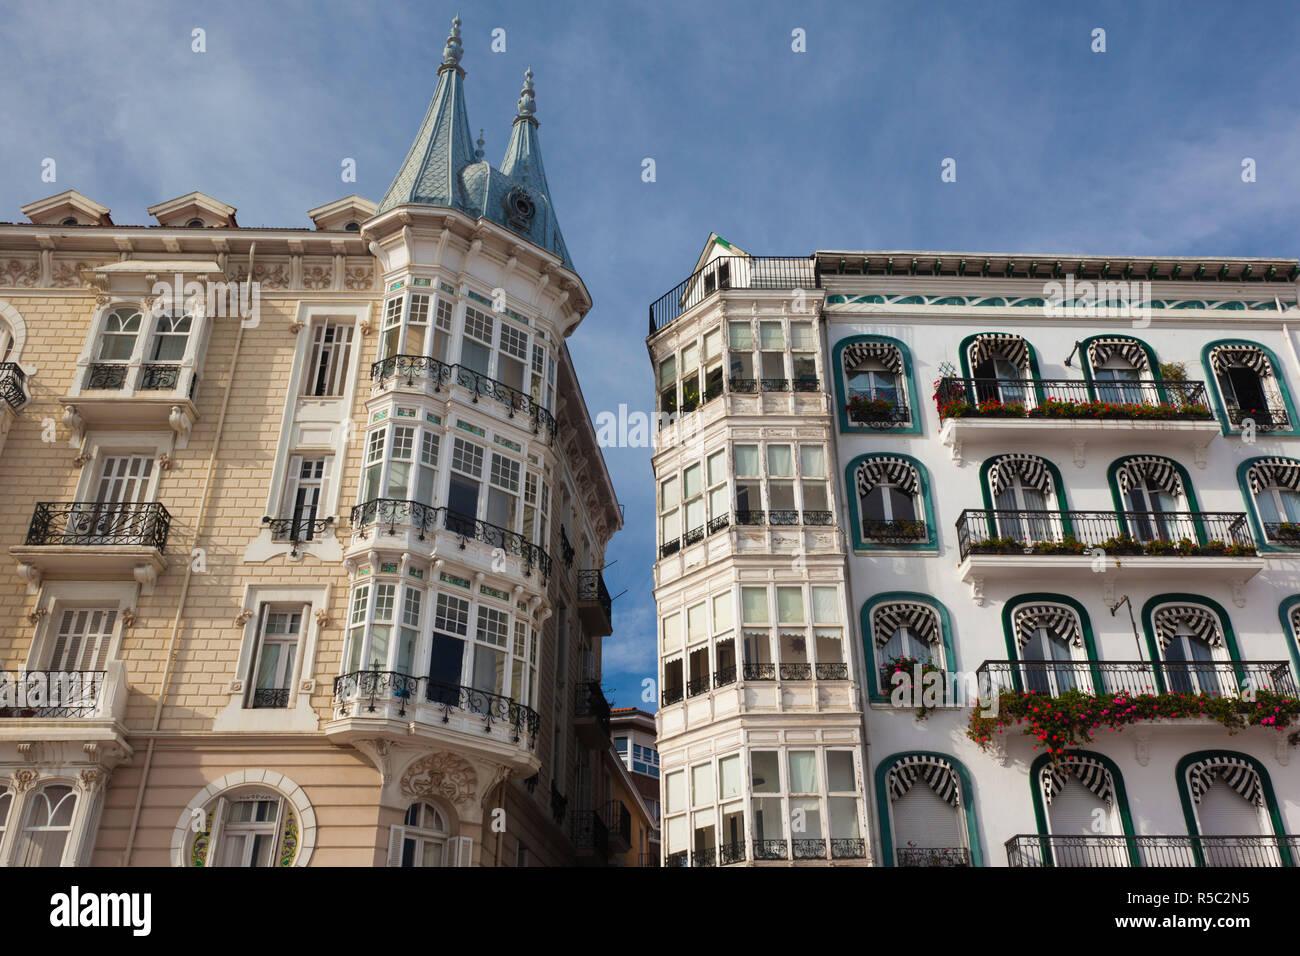 Spain, Cantabria Region, Cantabria Province, Castro-Urdiales, harborfront buildings - Stock Image